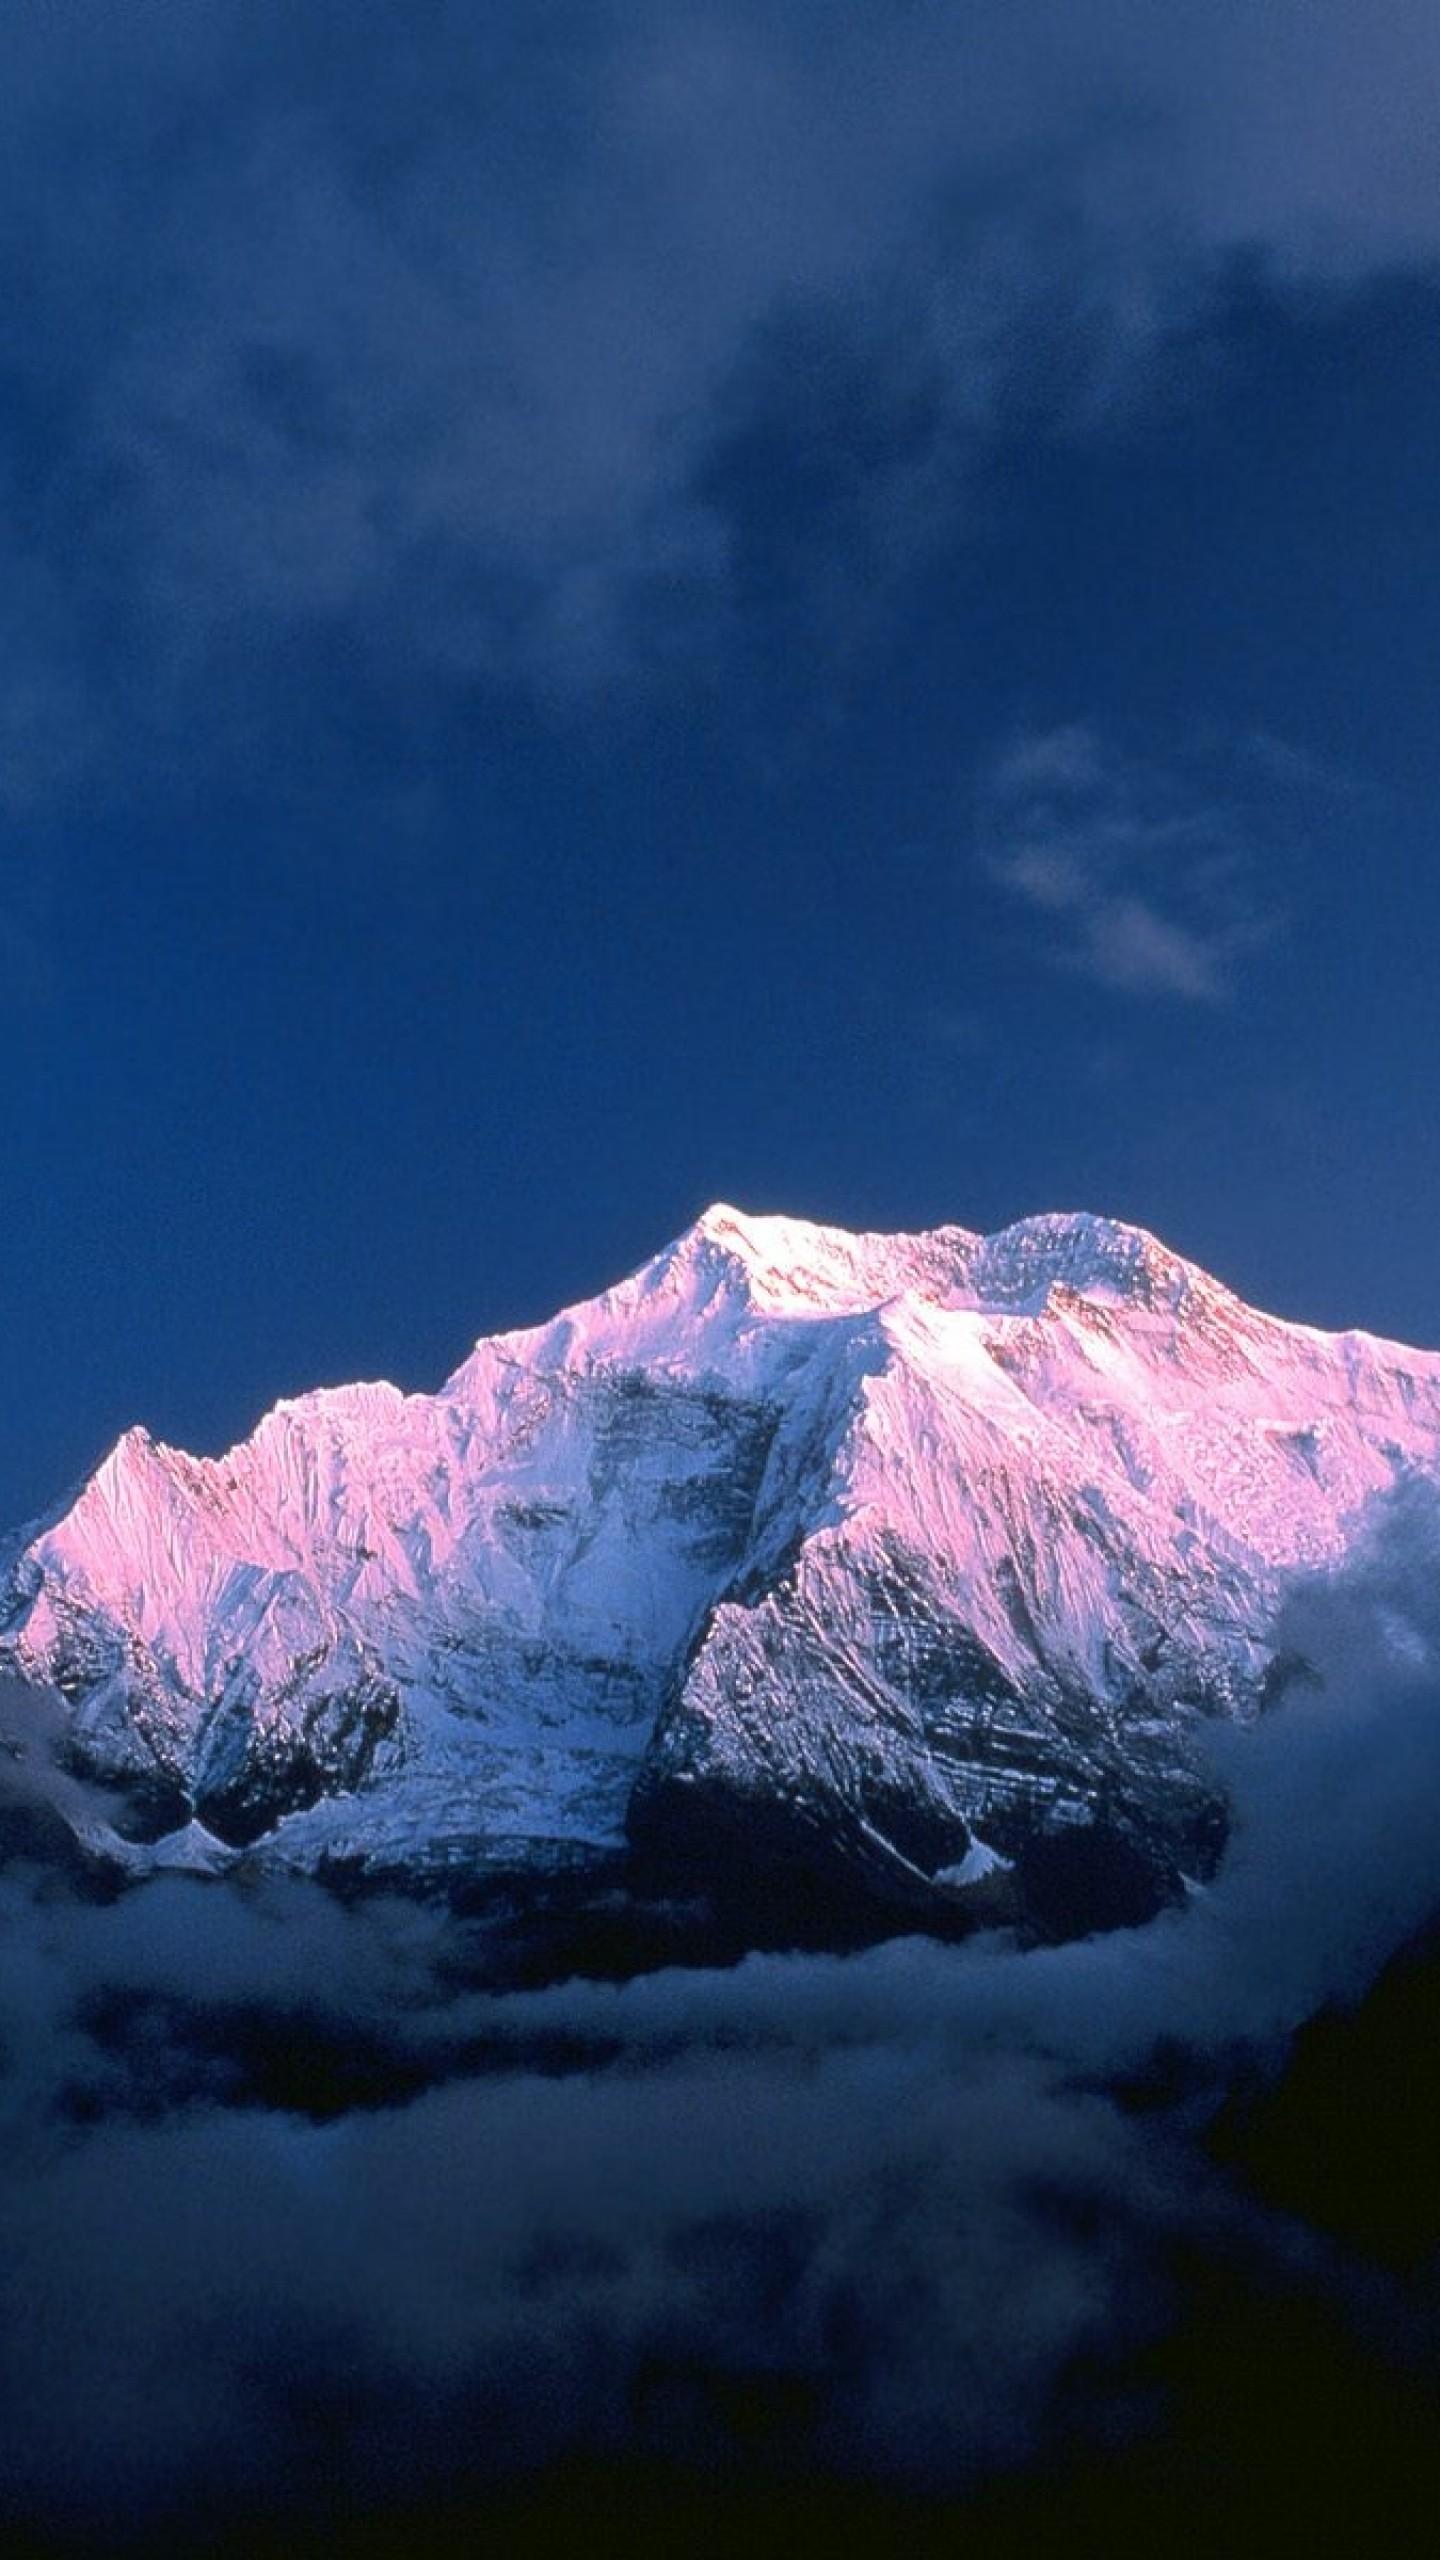 Hd Wallpaper Pc Himalayas Wallpaper 69 Images